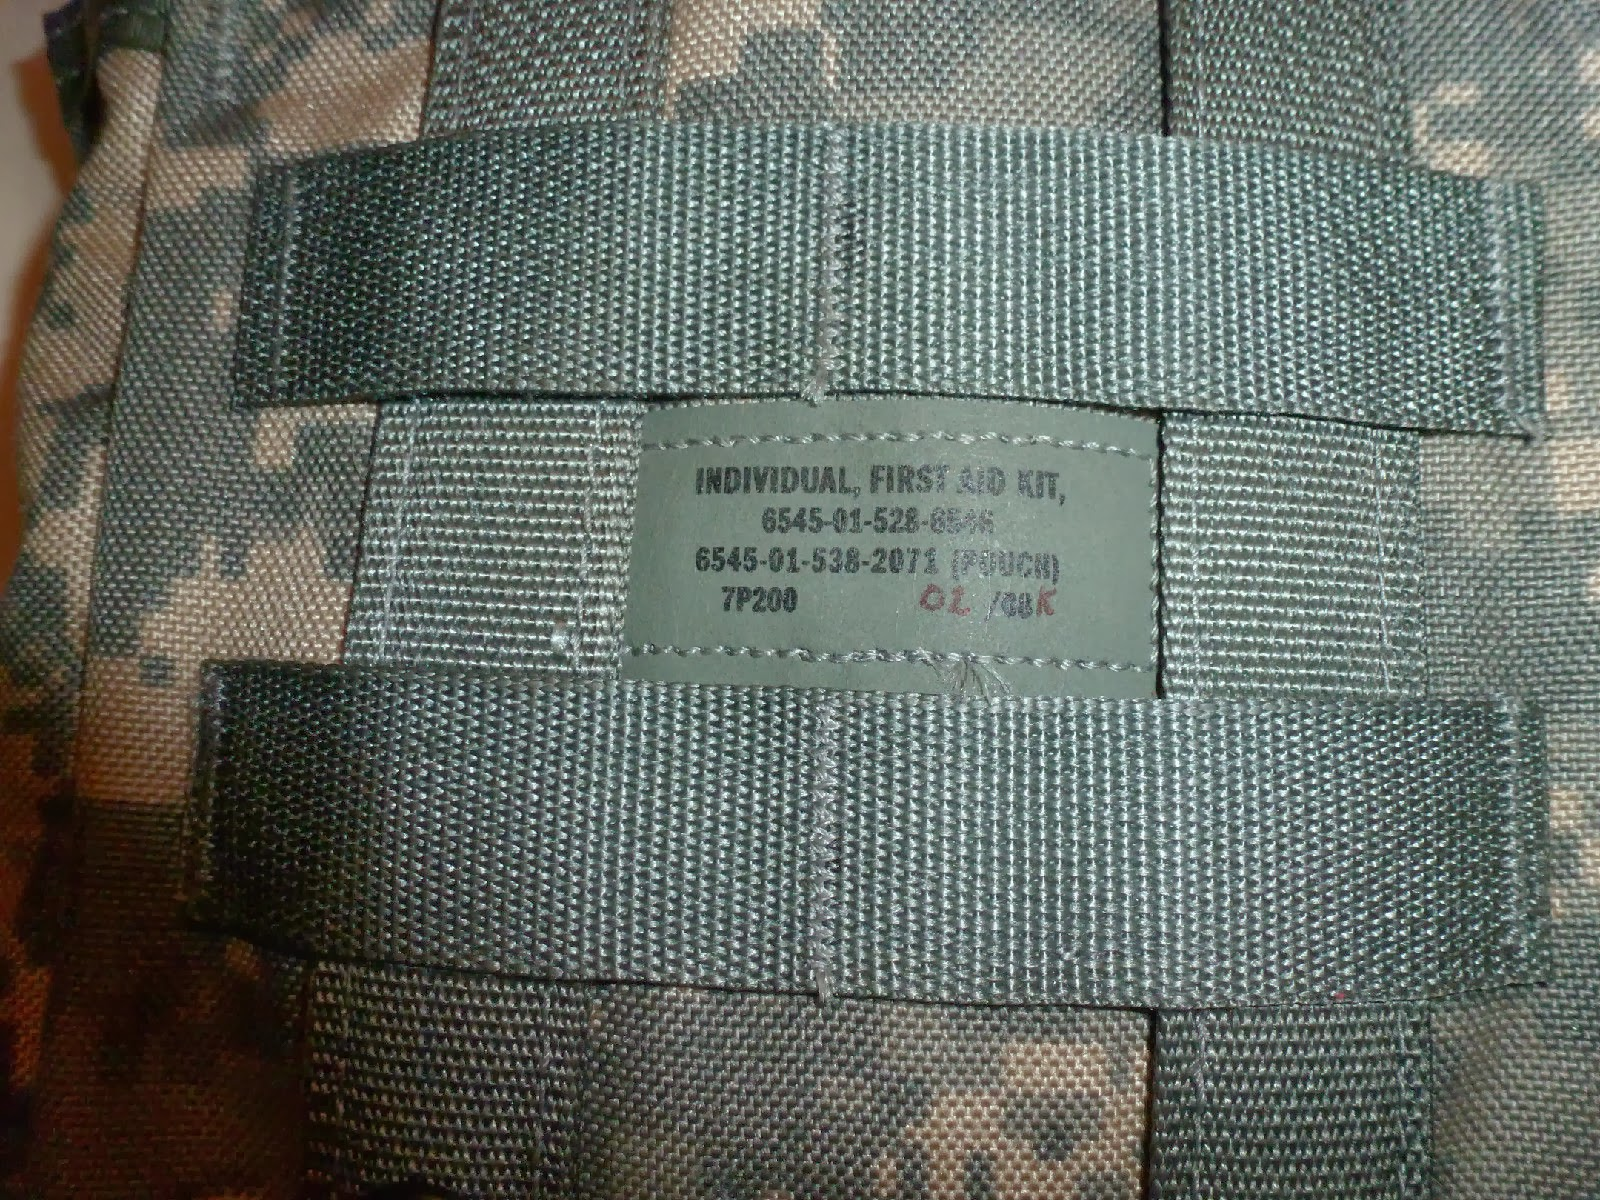 Webbingbabel: U S  Air Force Individual First-Aid Kit (IFAK)